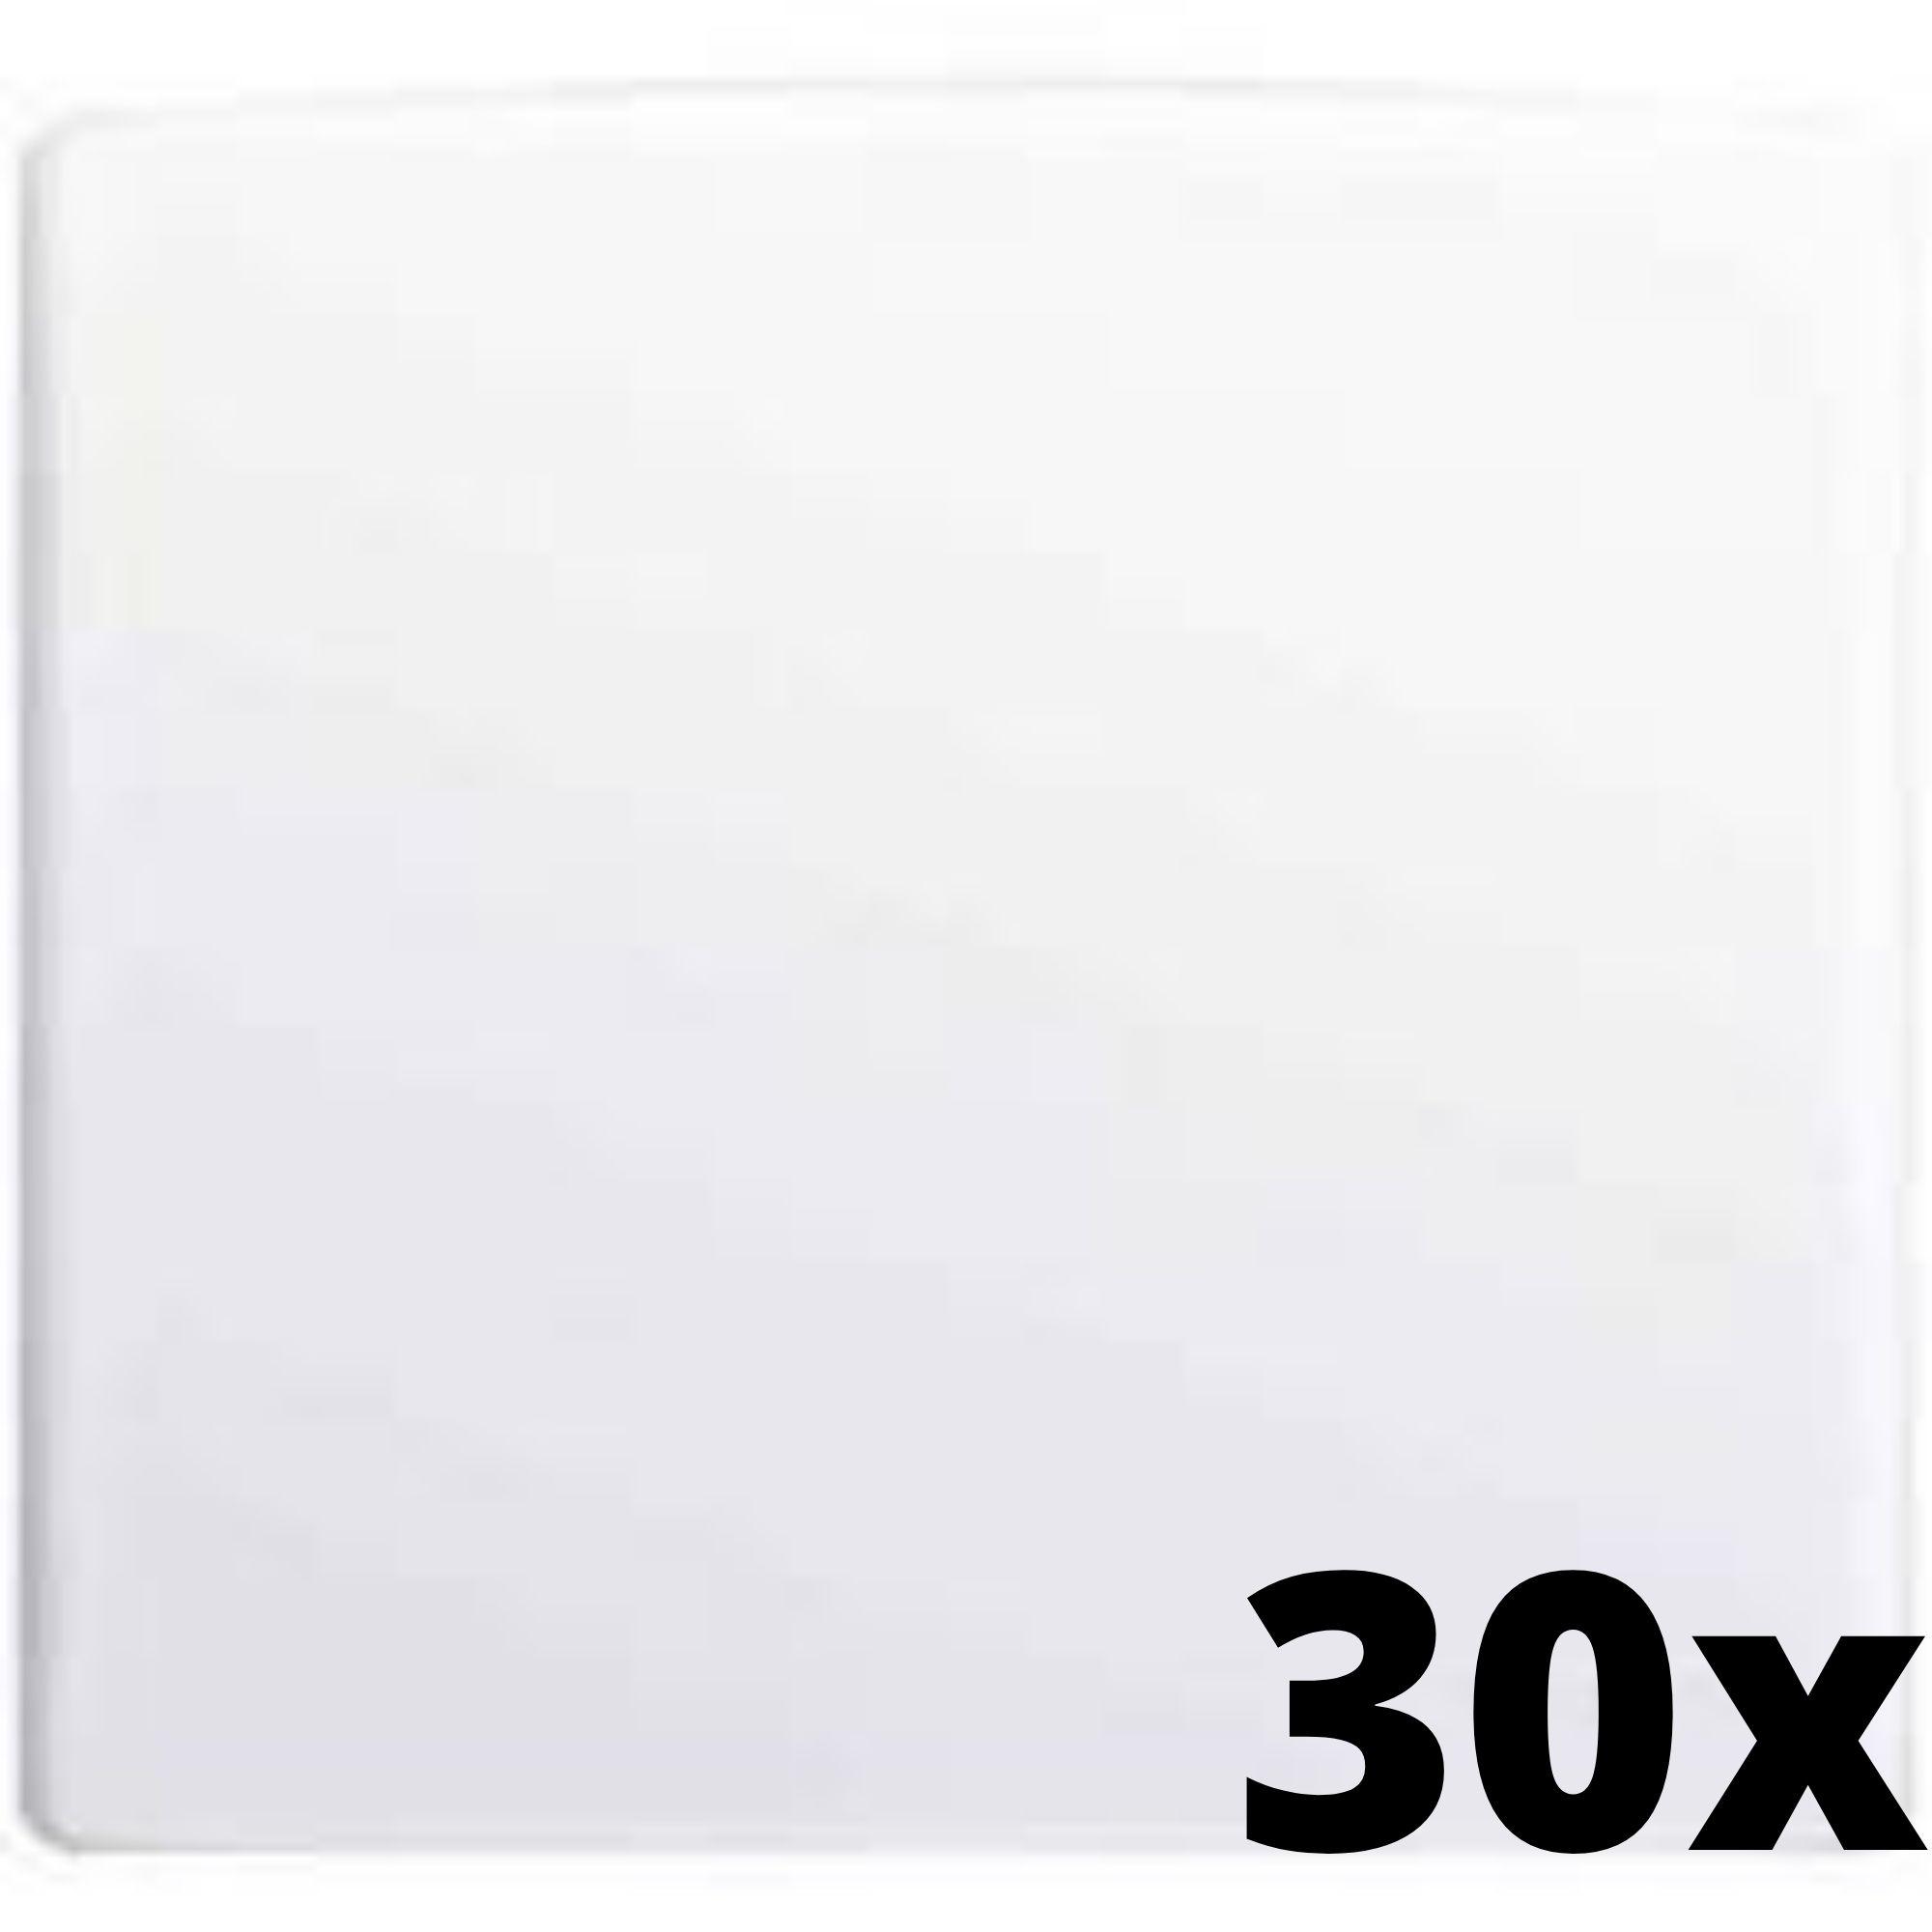 Kit 30 und Alumbra Bianco Pró Placa 4x4 Cega